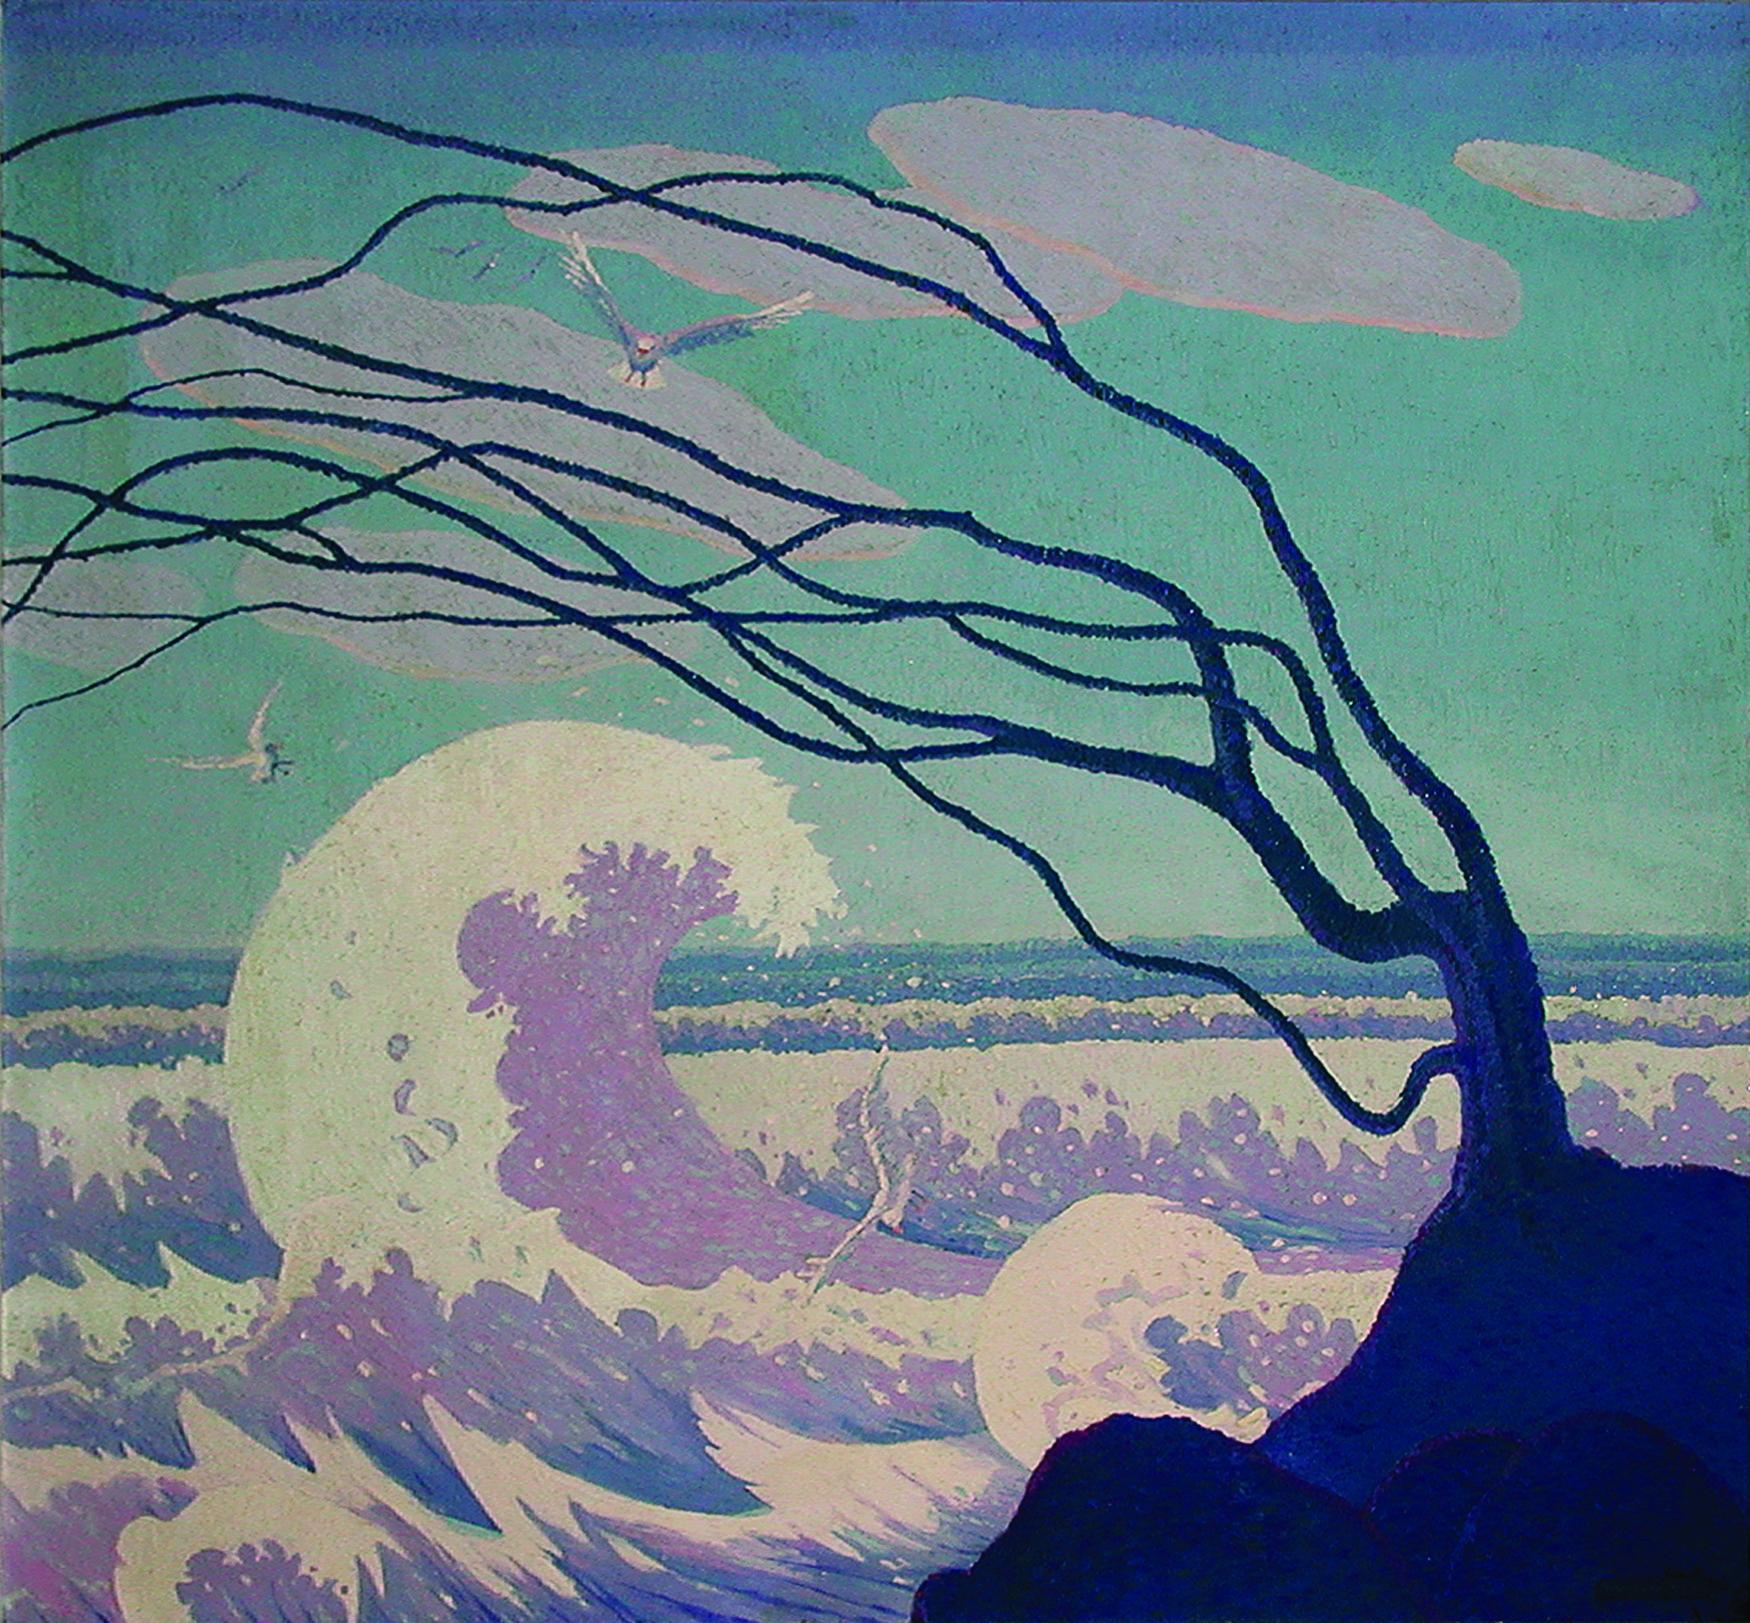 Rhythm of the Wind, 1917, Oil on linen